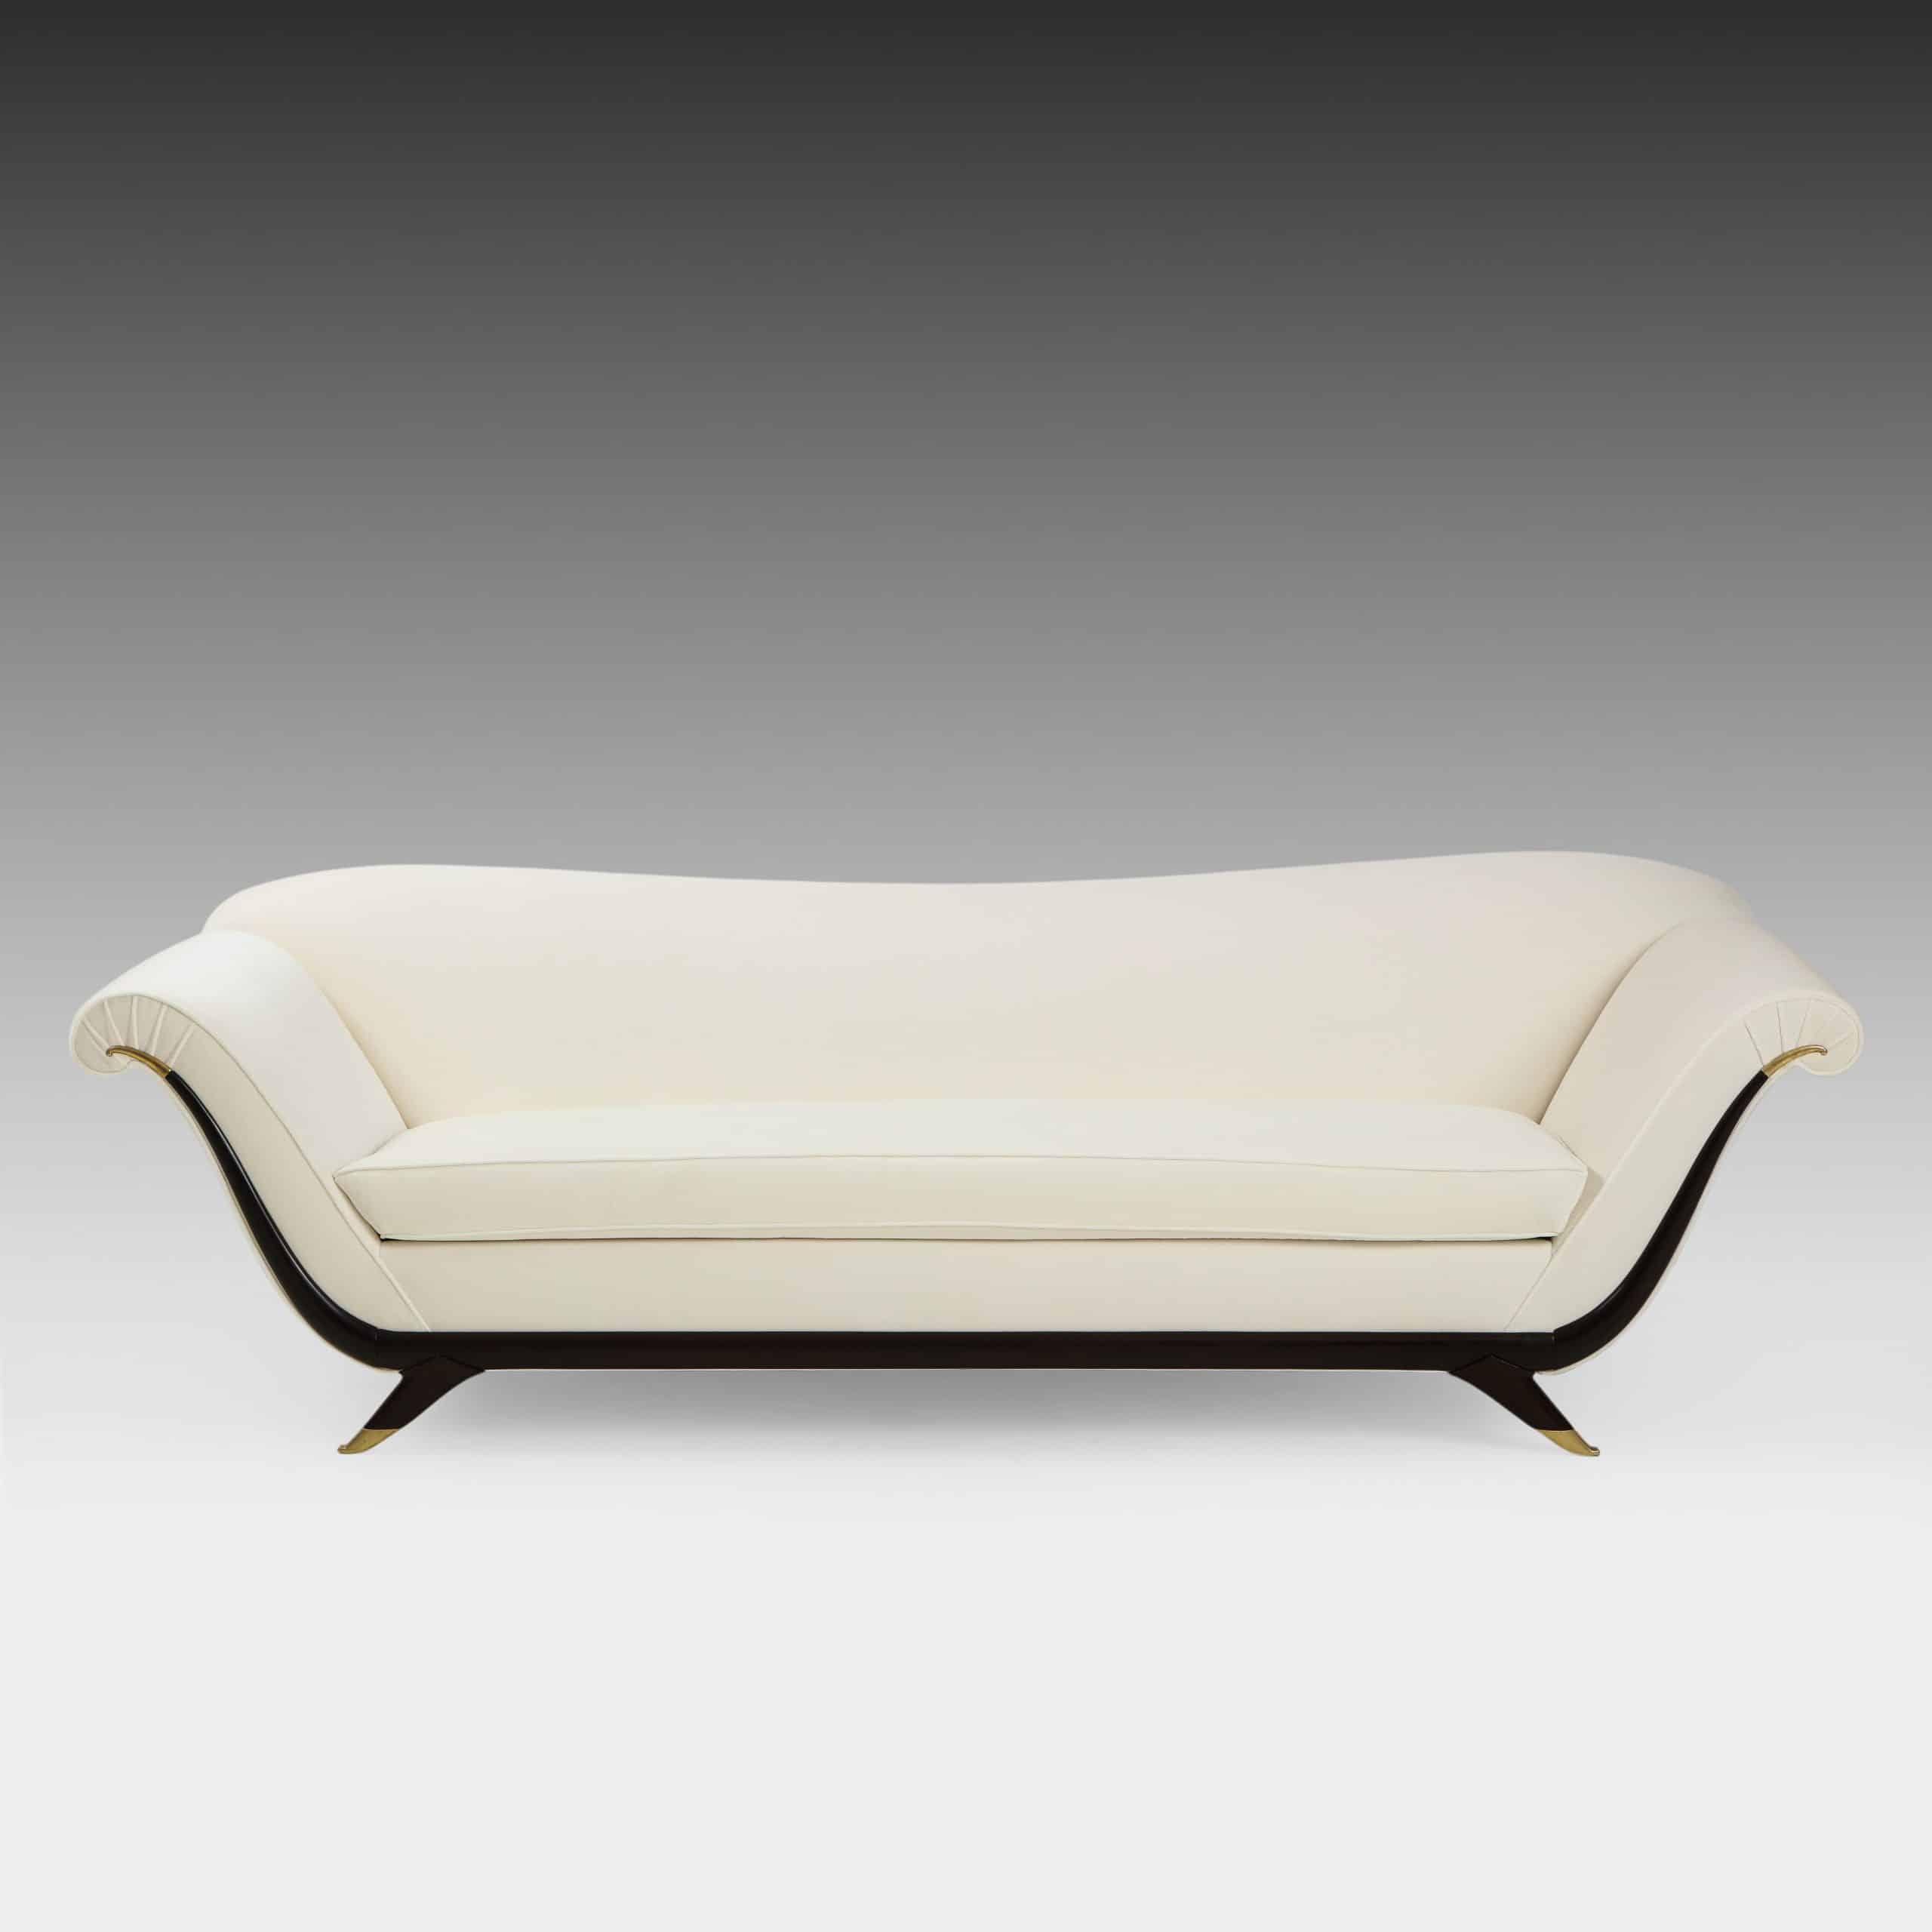 Ivory Velvet Sofa by Guglielmo Ulrich, attributed to | soyun k.